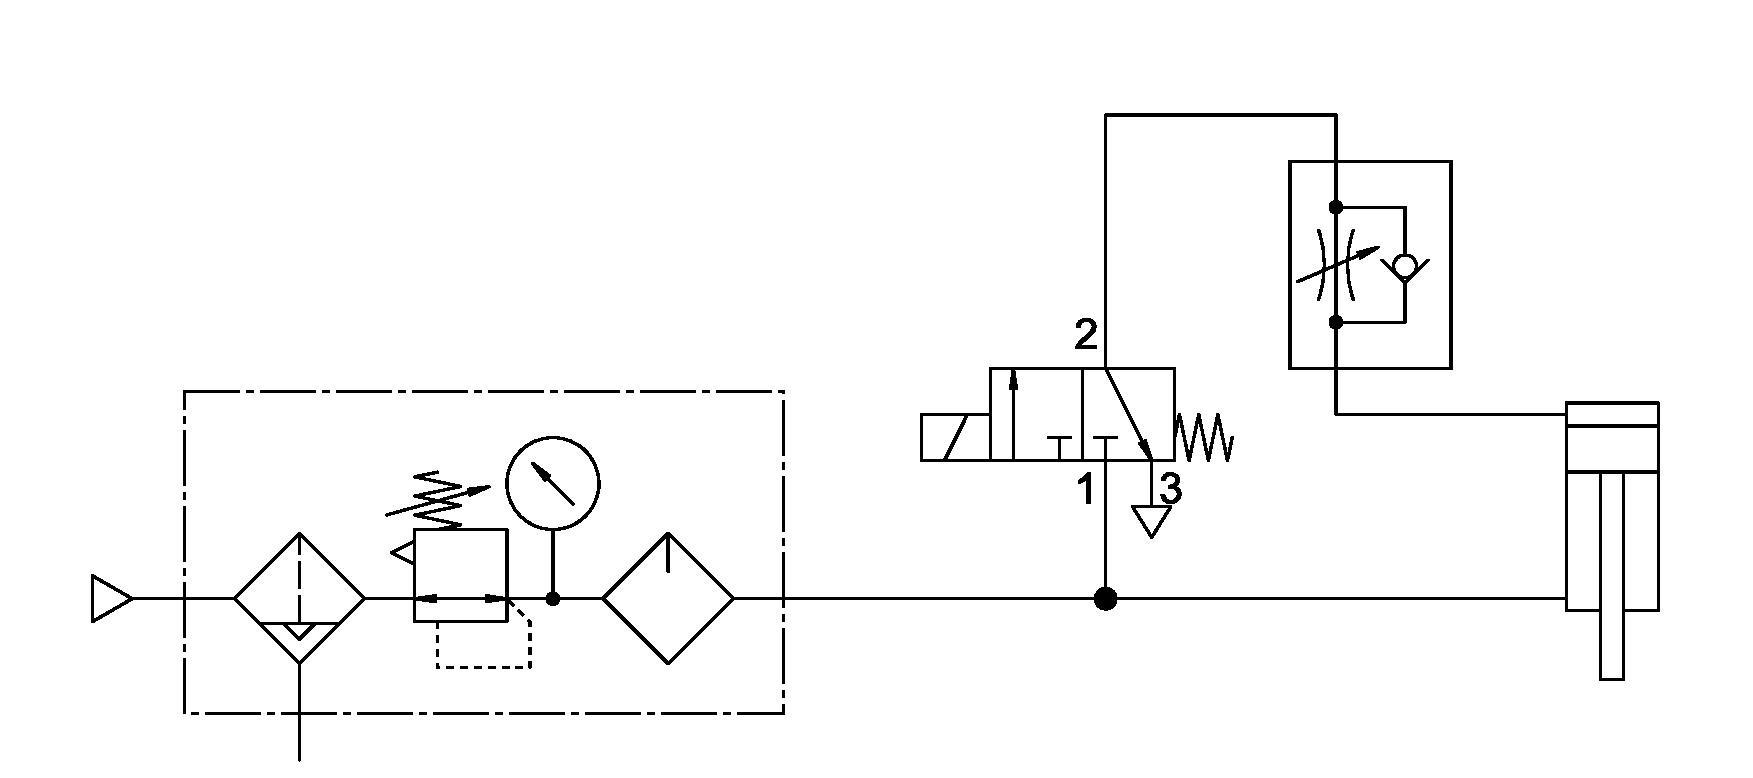 John Deere Lx176 Parts Diagram Besides John Deere F935 Wiring Diagram